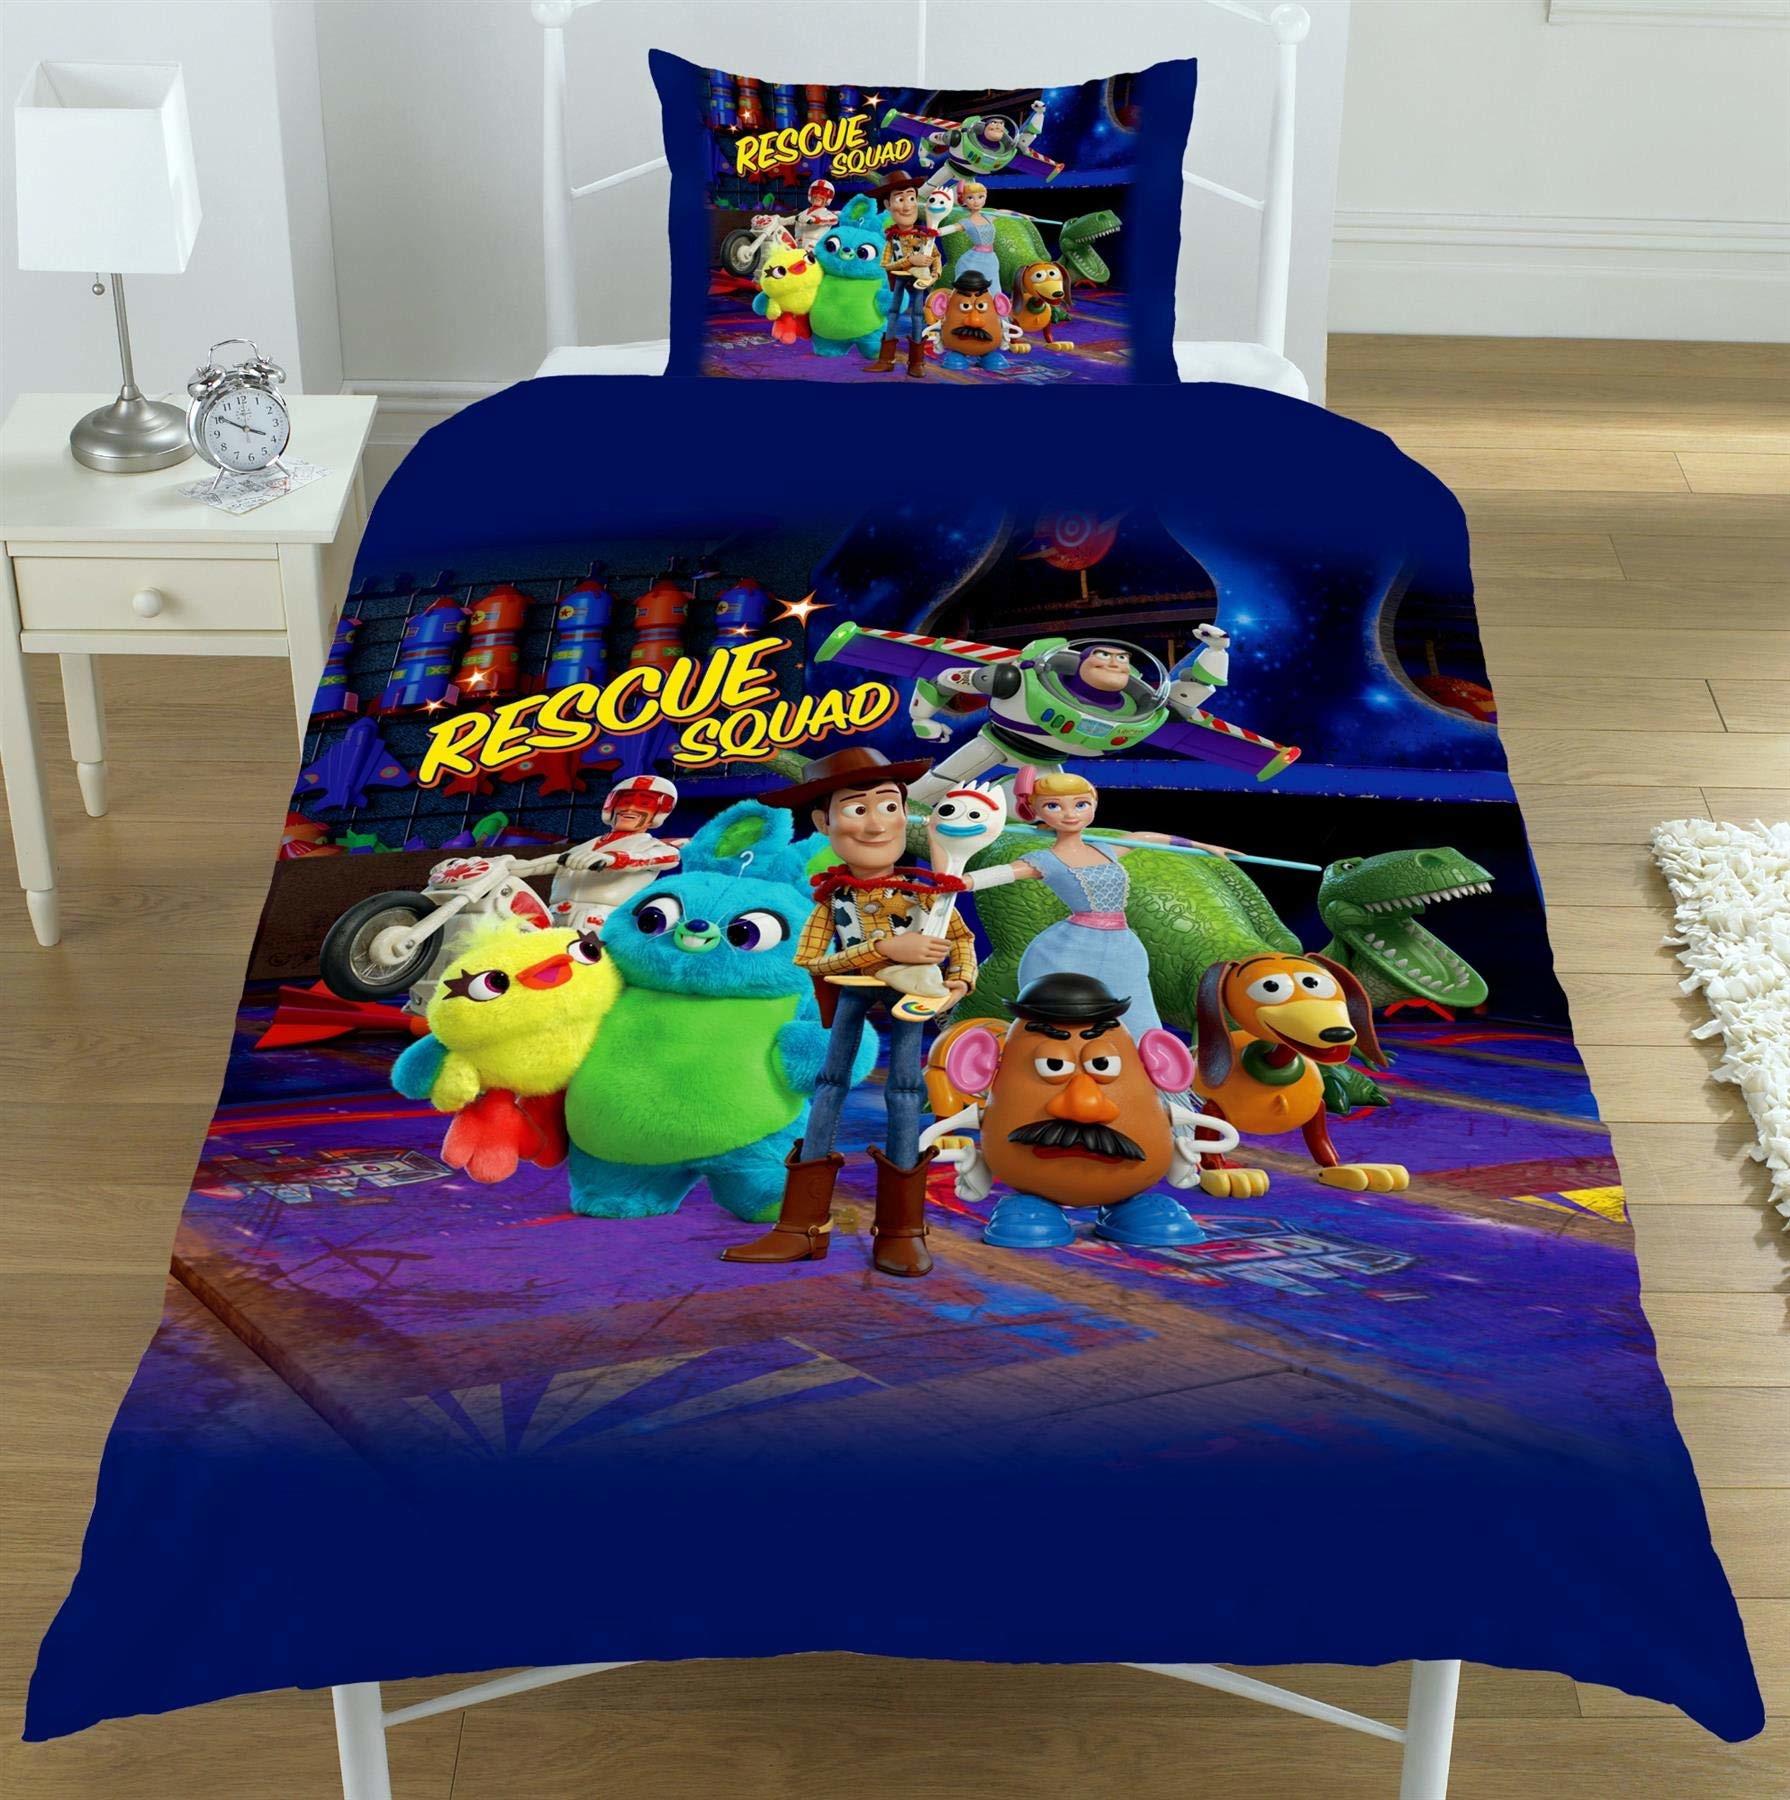 Disney Pixar Toy Story 4 Junior Dekbedovertrek Rescue Squad